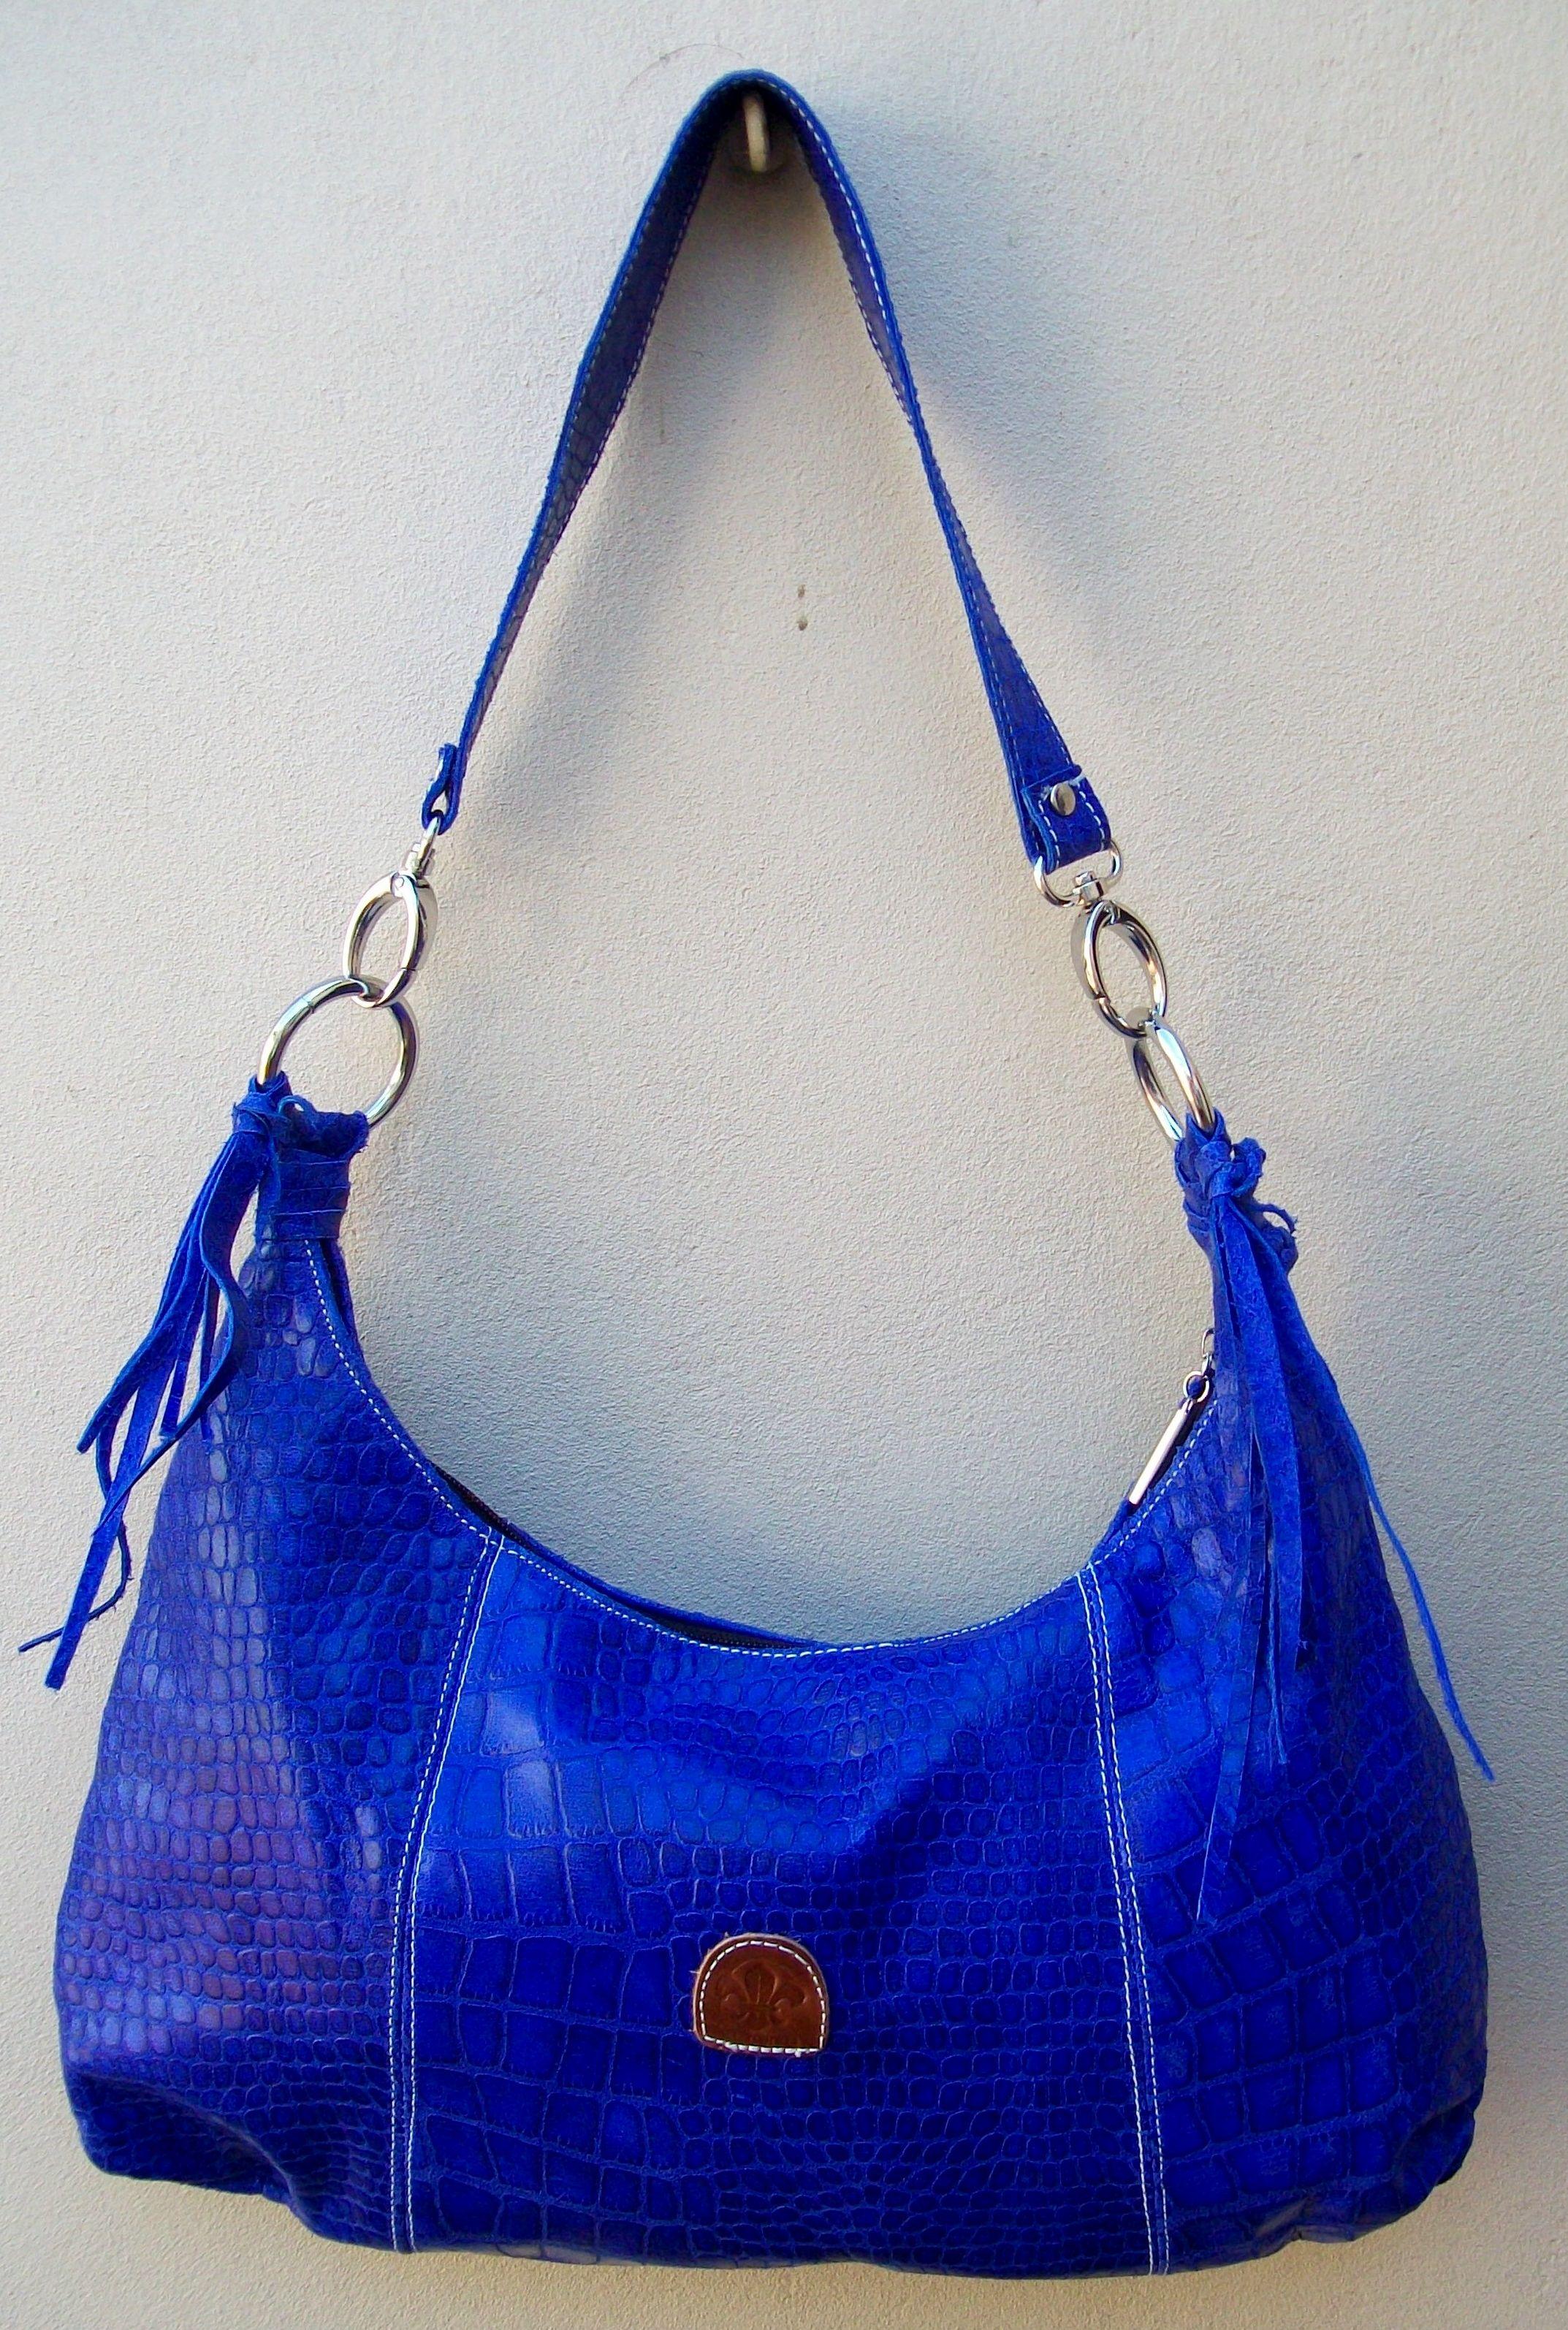 gran descuento 07f2f a483e Cartera Ludmila Cuero croco. Color azul eléctrico. Interior ...